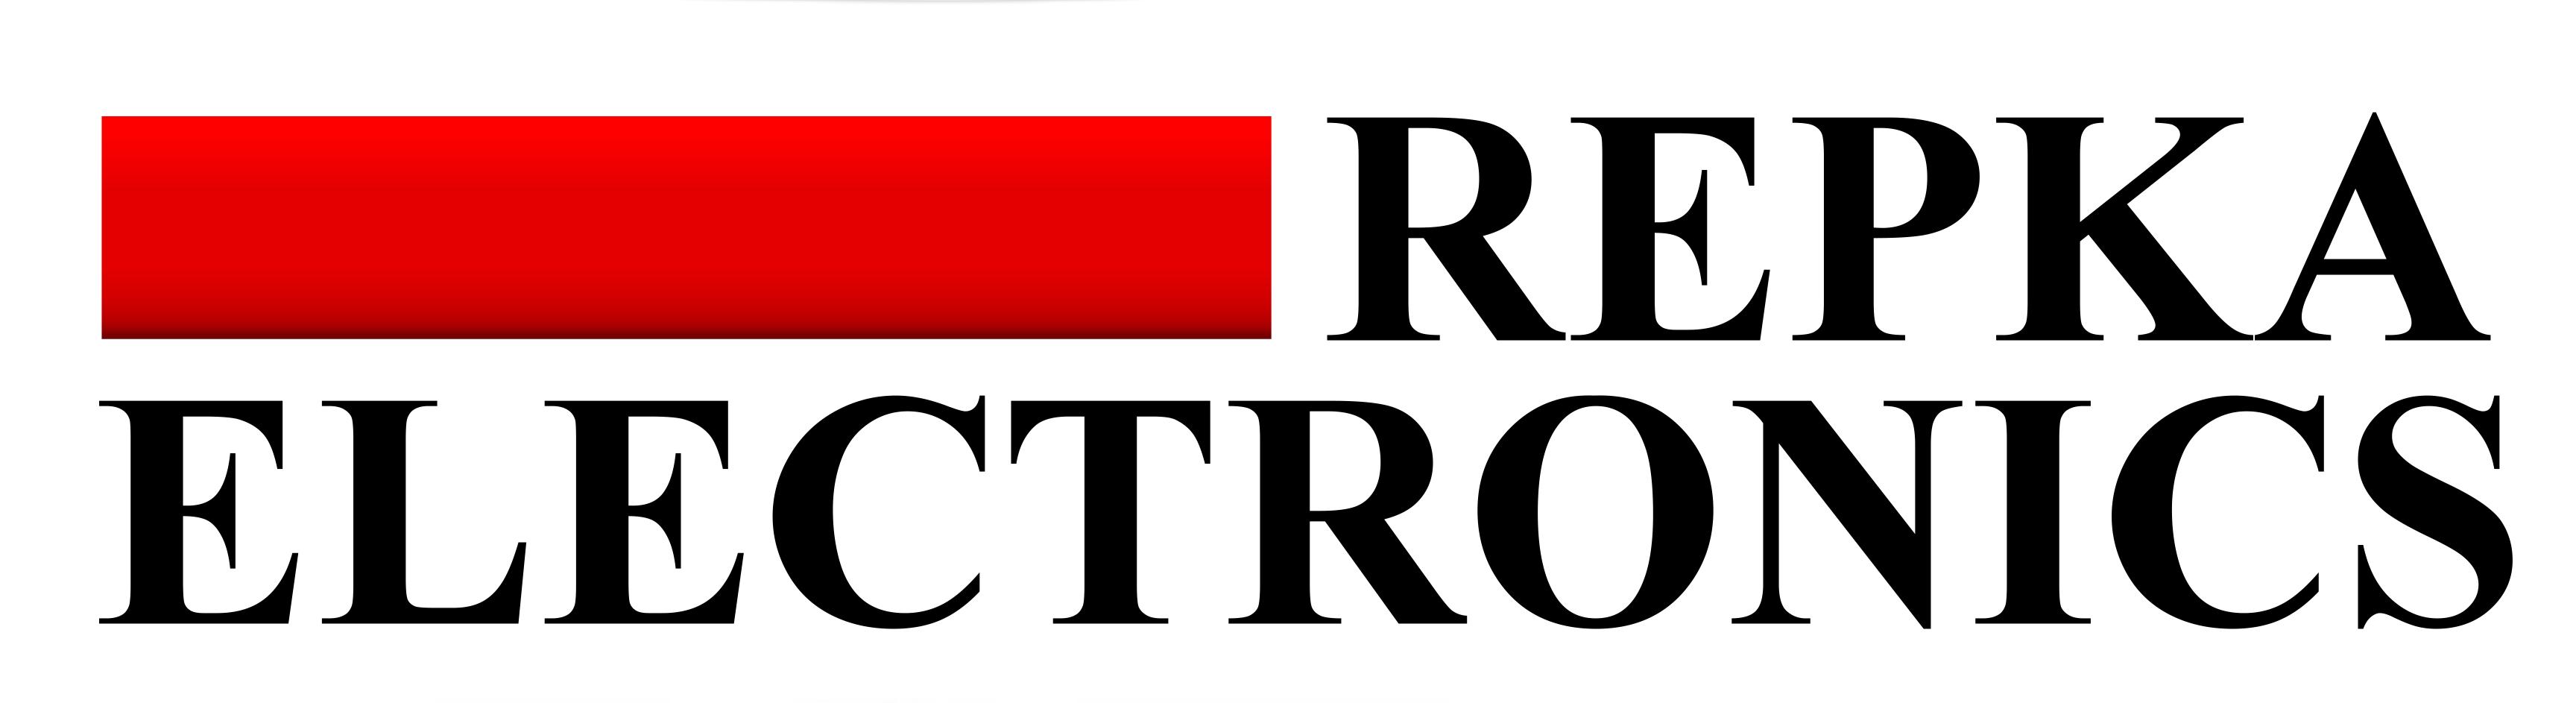 Repka Electronics